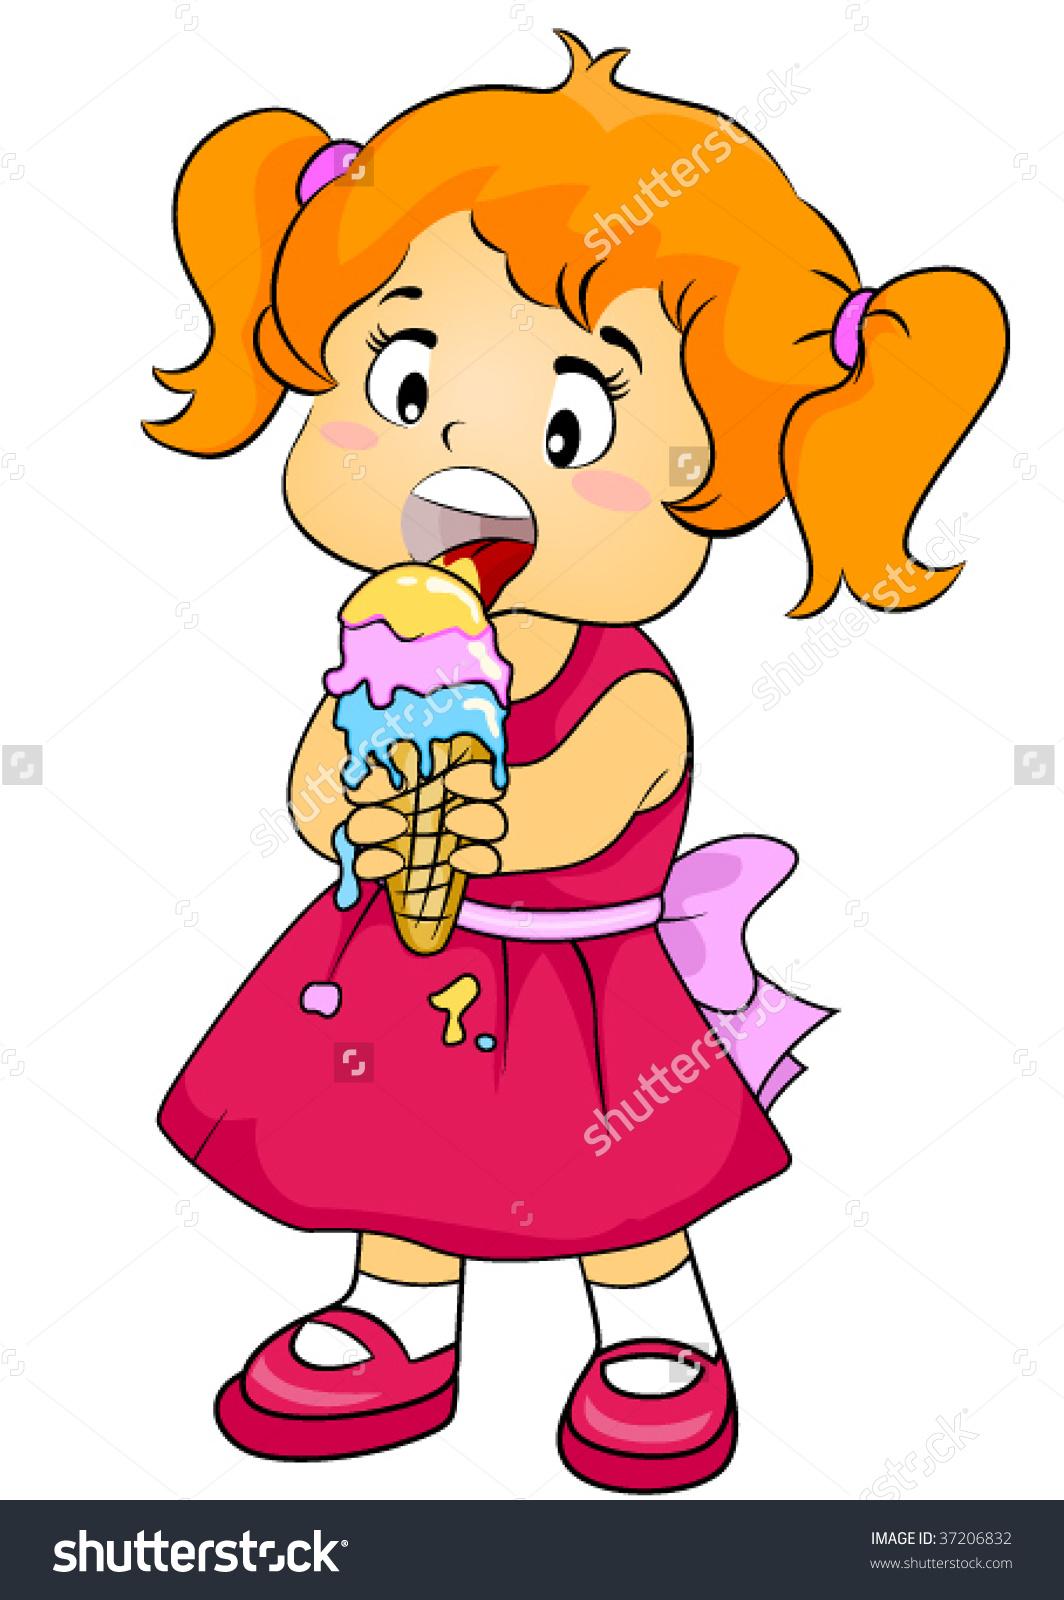 Child eating ice cream clipart.